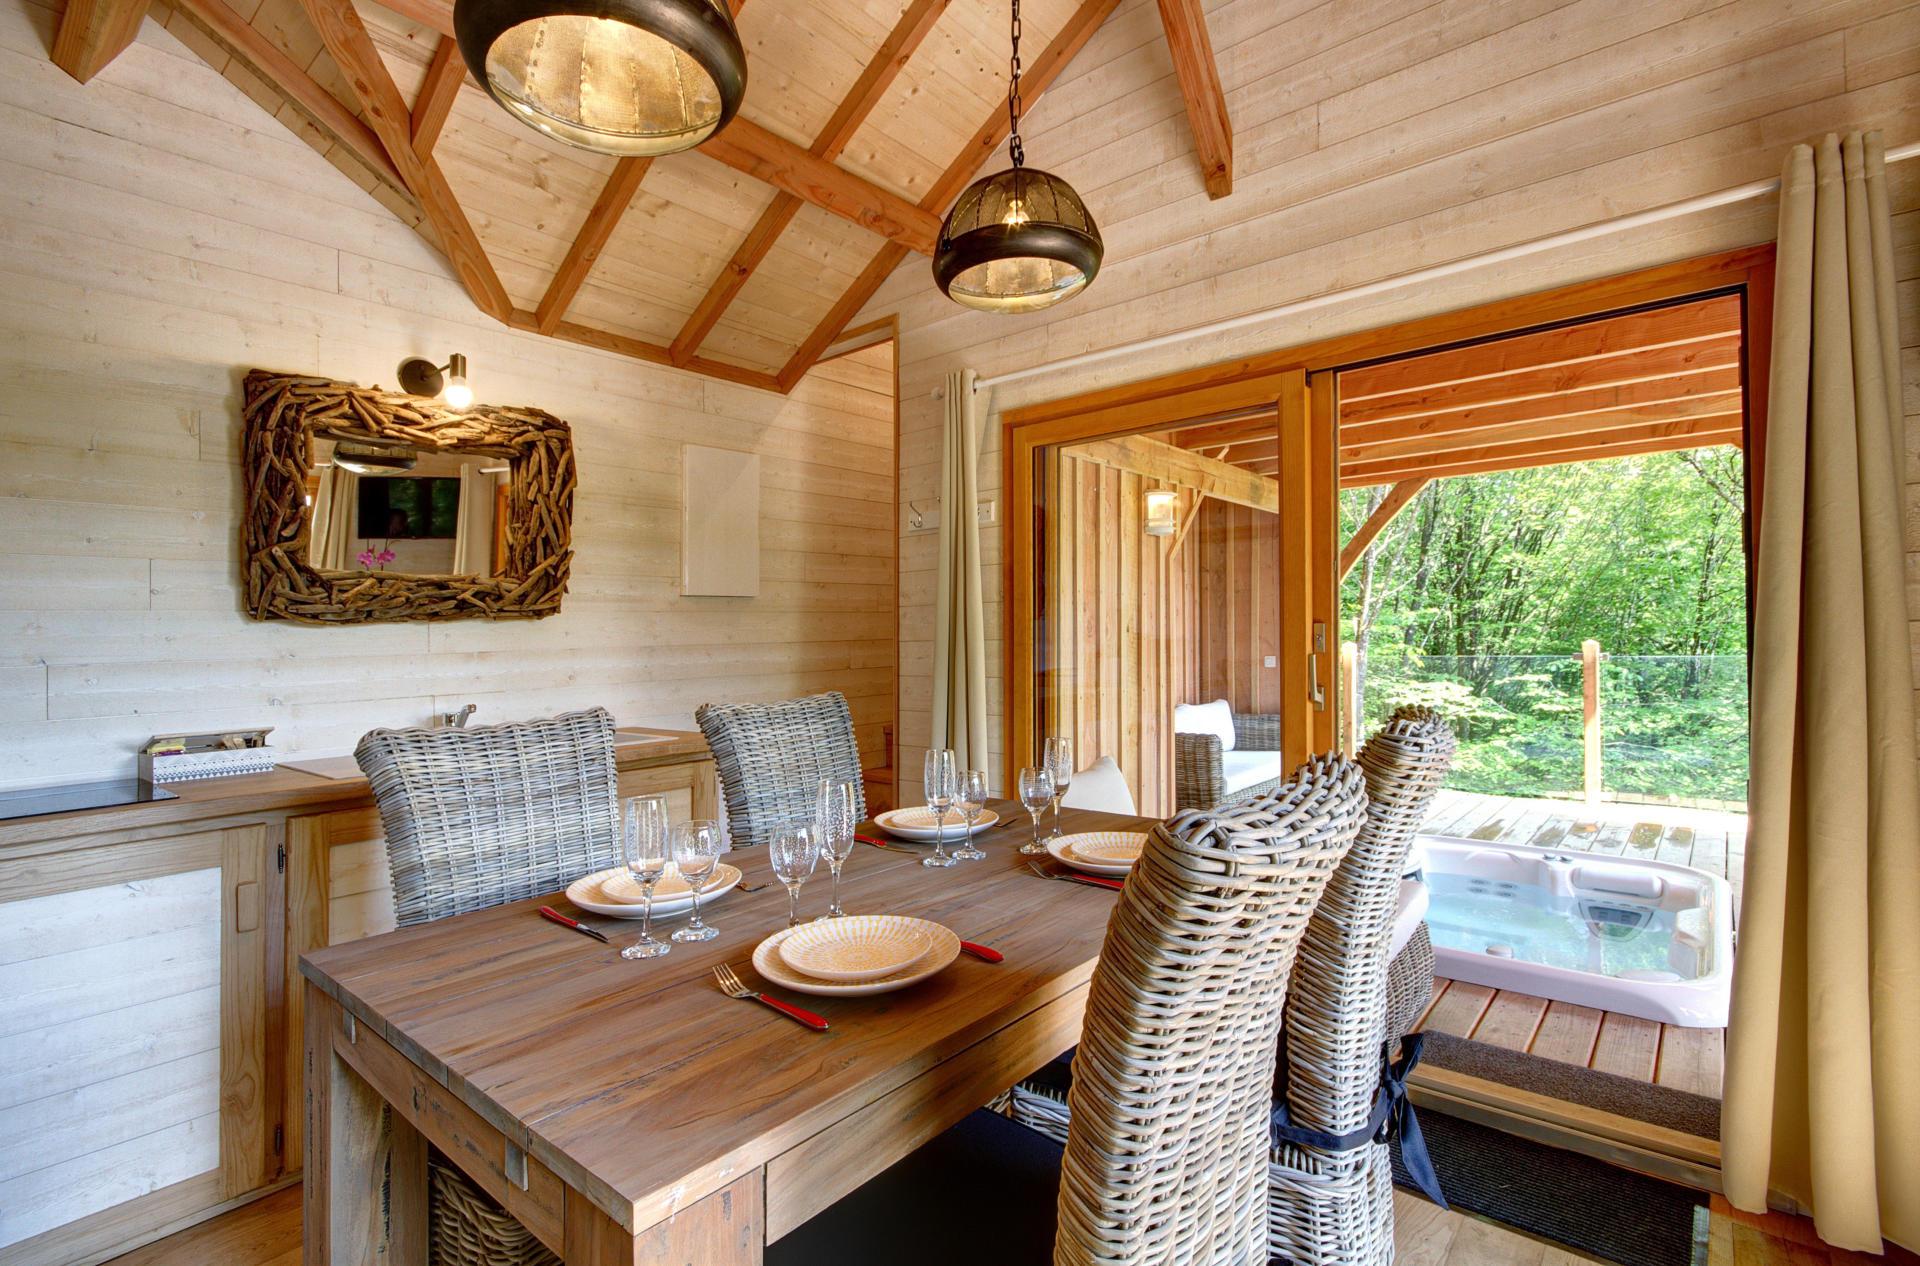 des cabanes d 39 exception pour glamper chic tourisme. Black Bedroom Furniture Sets. Home Design Ideas